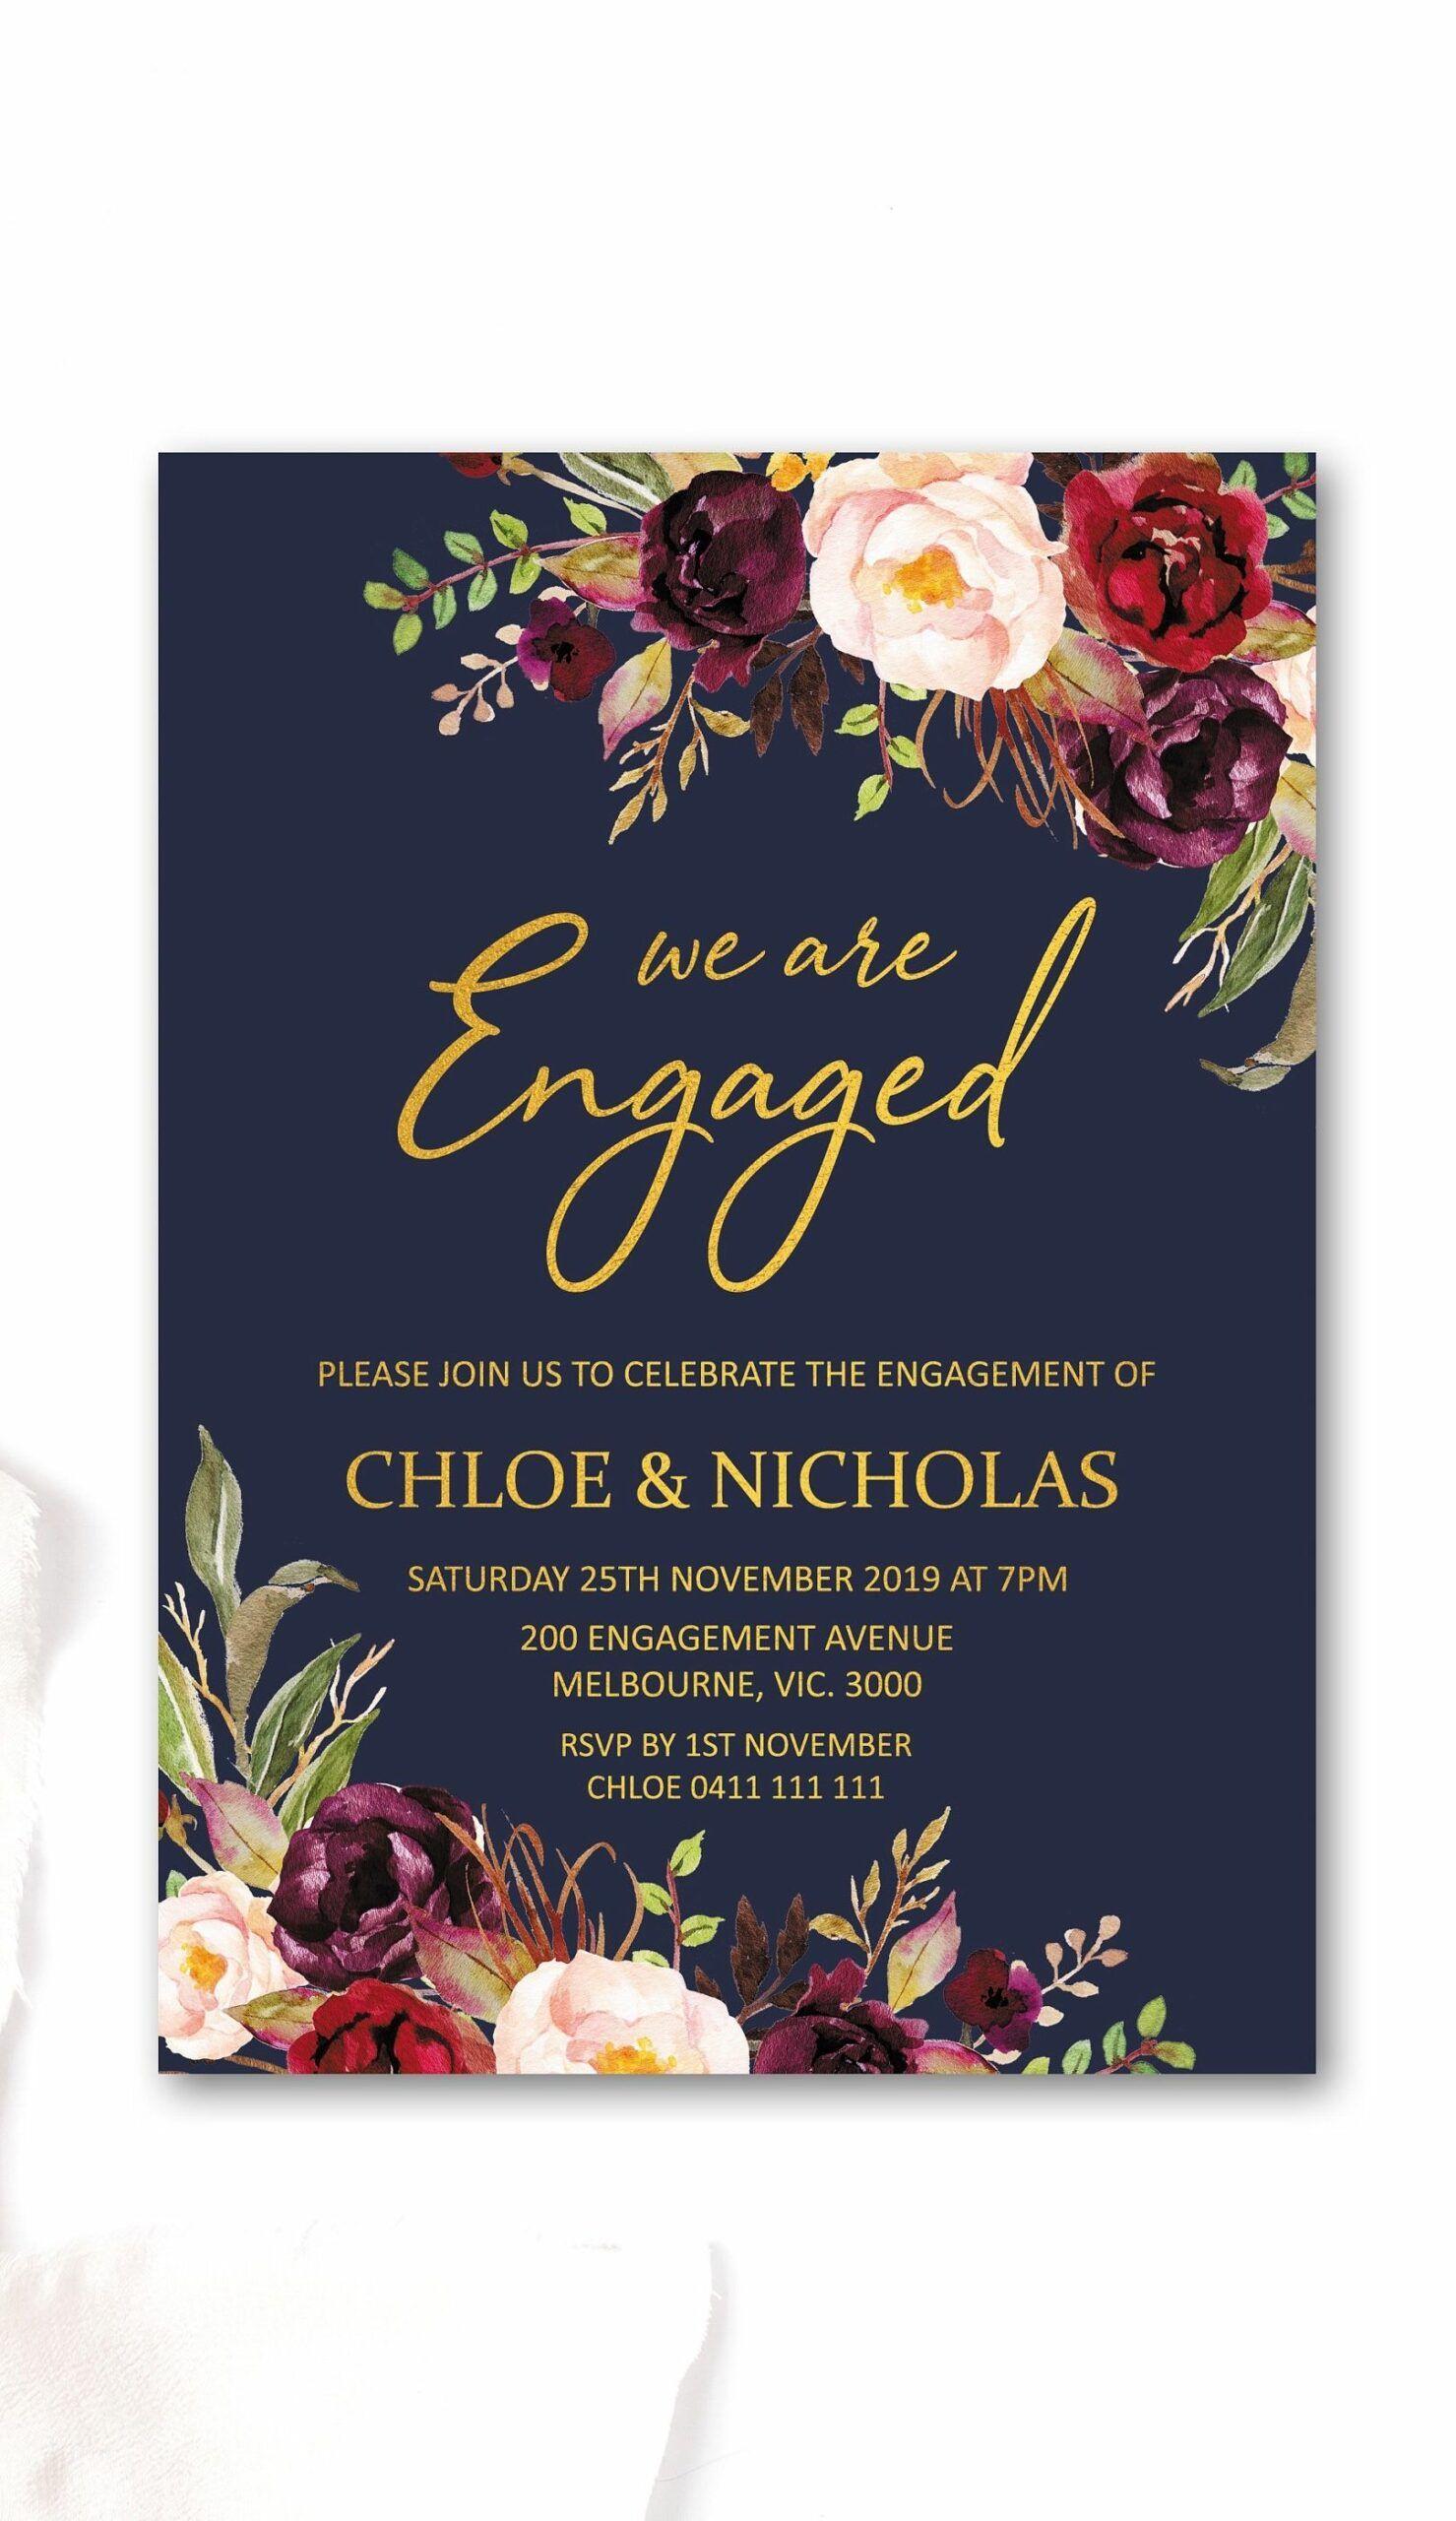 10 Top Invitation Card Engagement Engagement Party Invitations Engagement Invitation Cards Printable Engagement Party Invitations